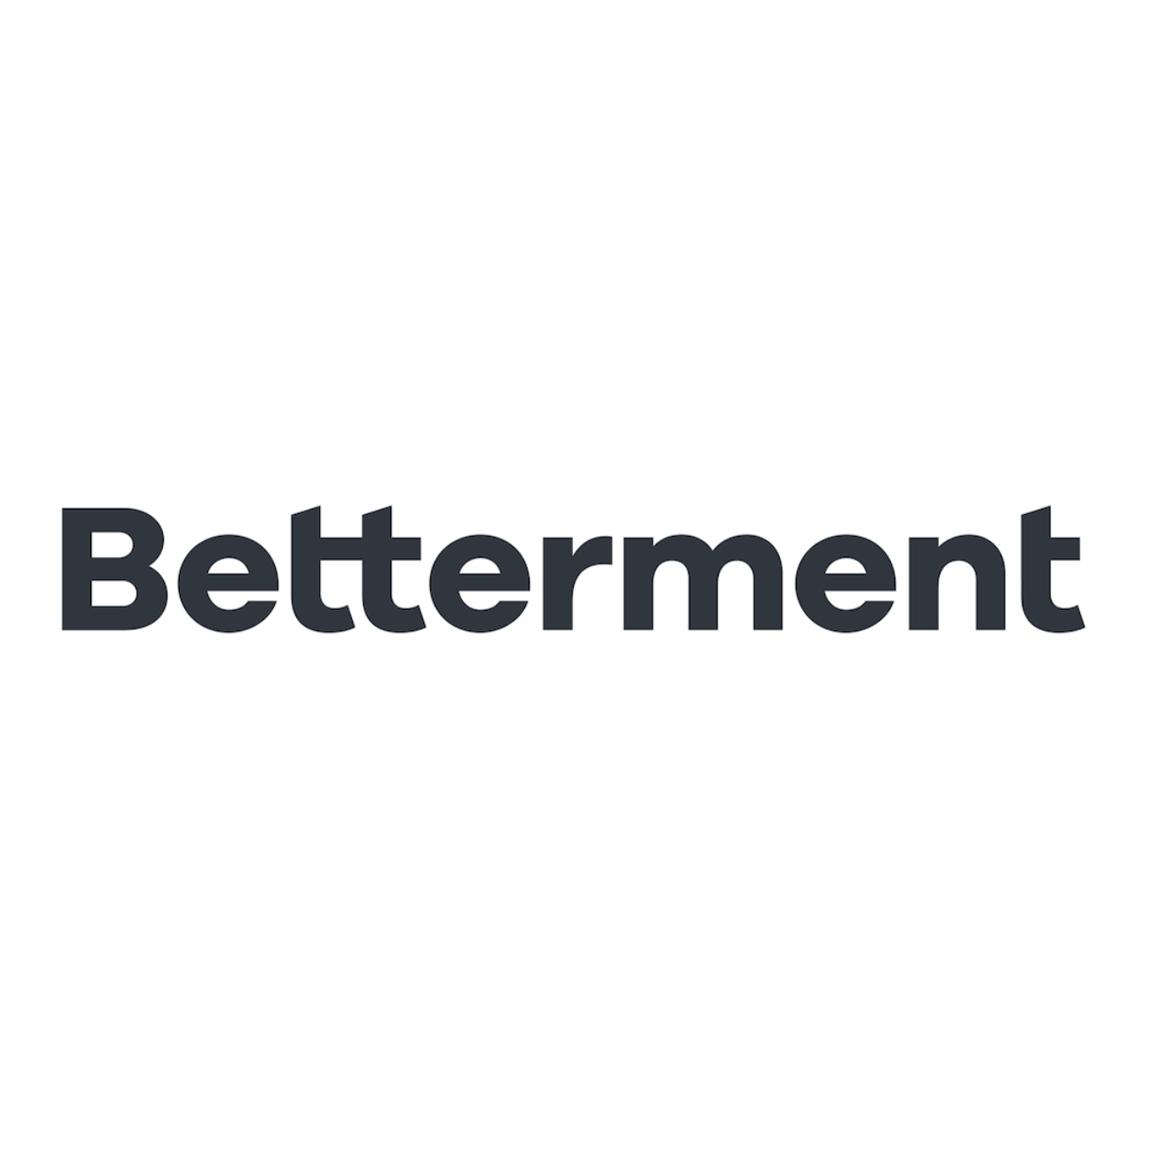 Susan Justus – Betterment